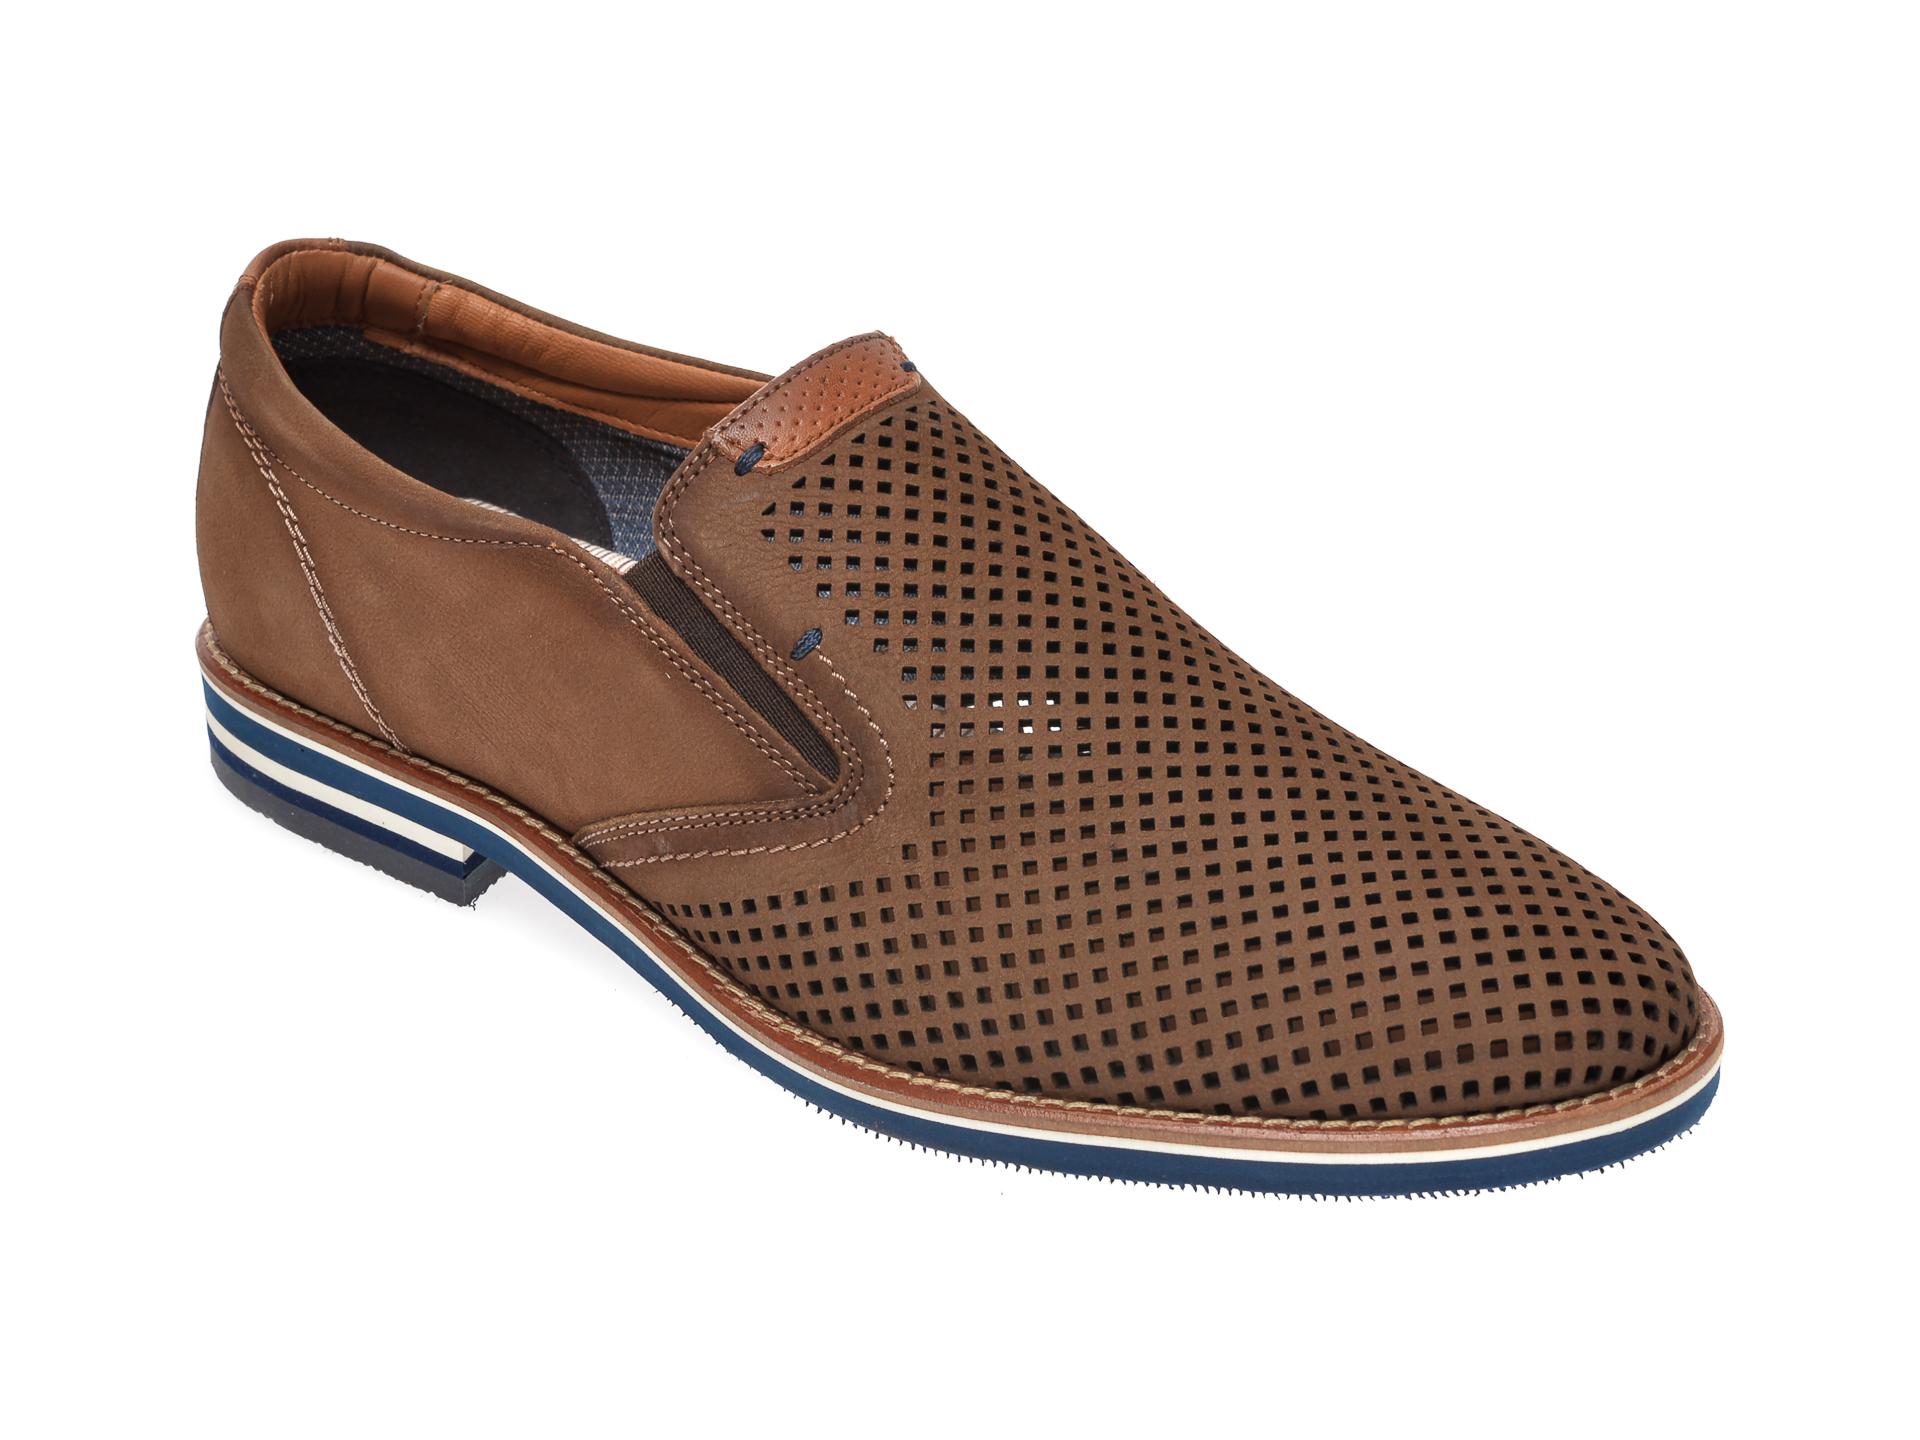 Pantofi SALAMANDER taupe, 57329, din nabuc imagine